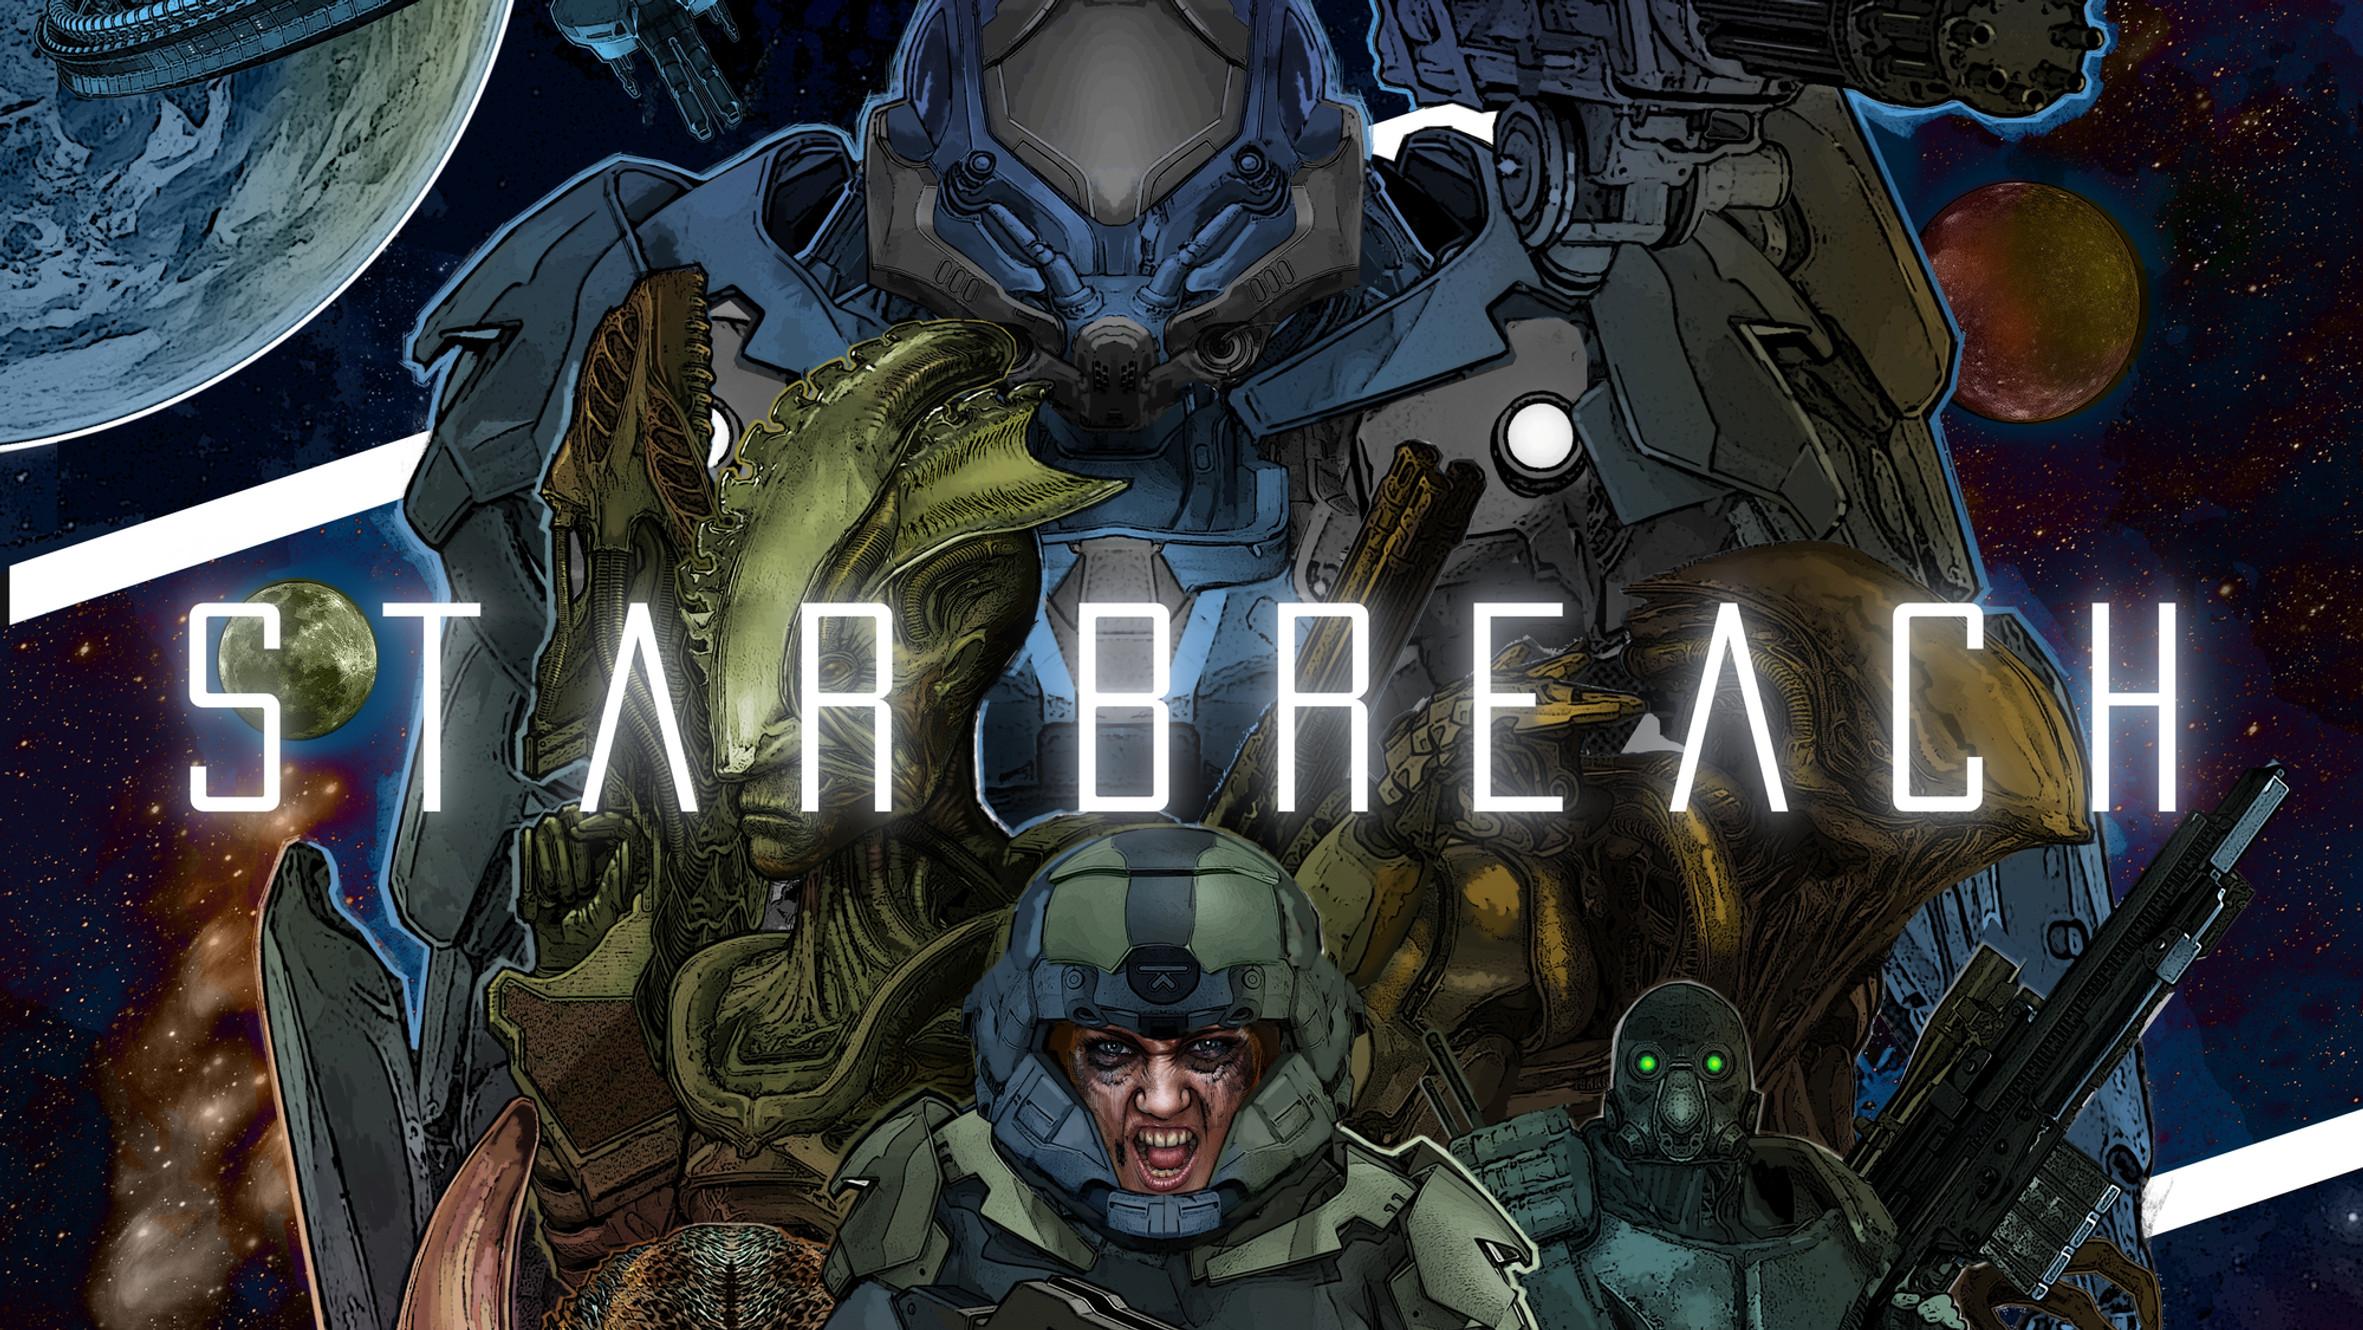 www.starbreach.com